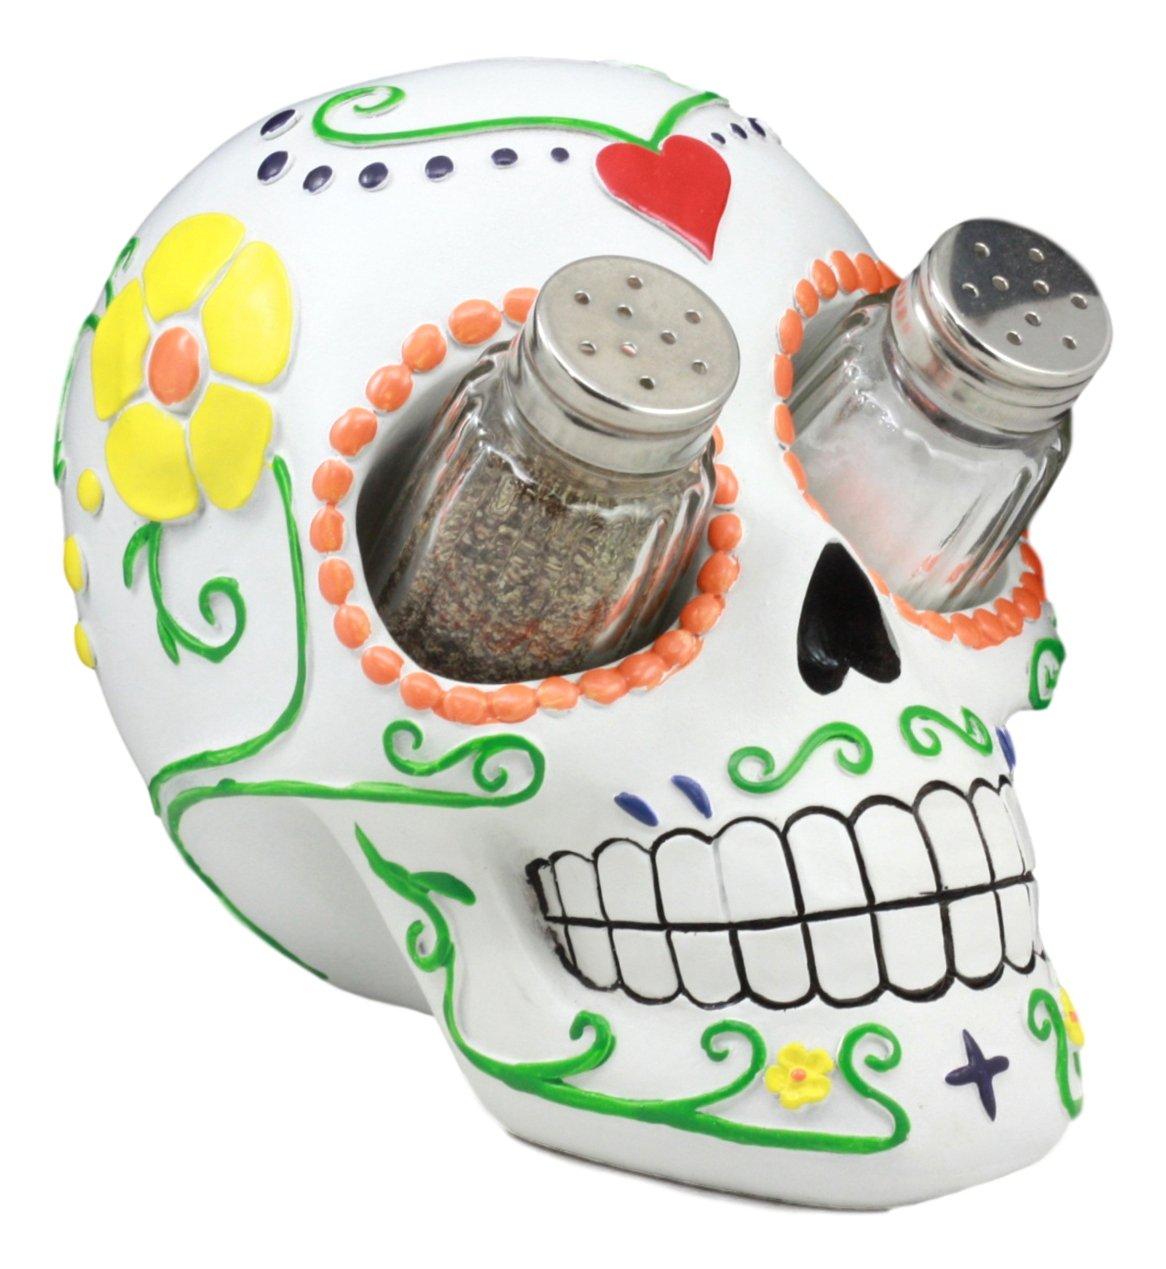 Ebros Day of The Dead Tattoo White Sugar Skull Salt And Pepper Shakers Holder Figurine Romantic Skull Kitchen Decor